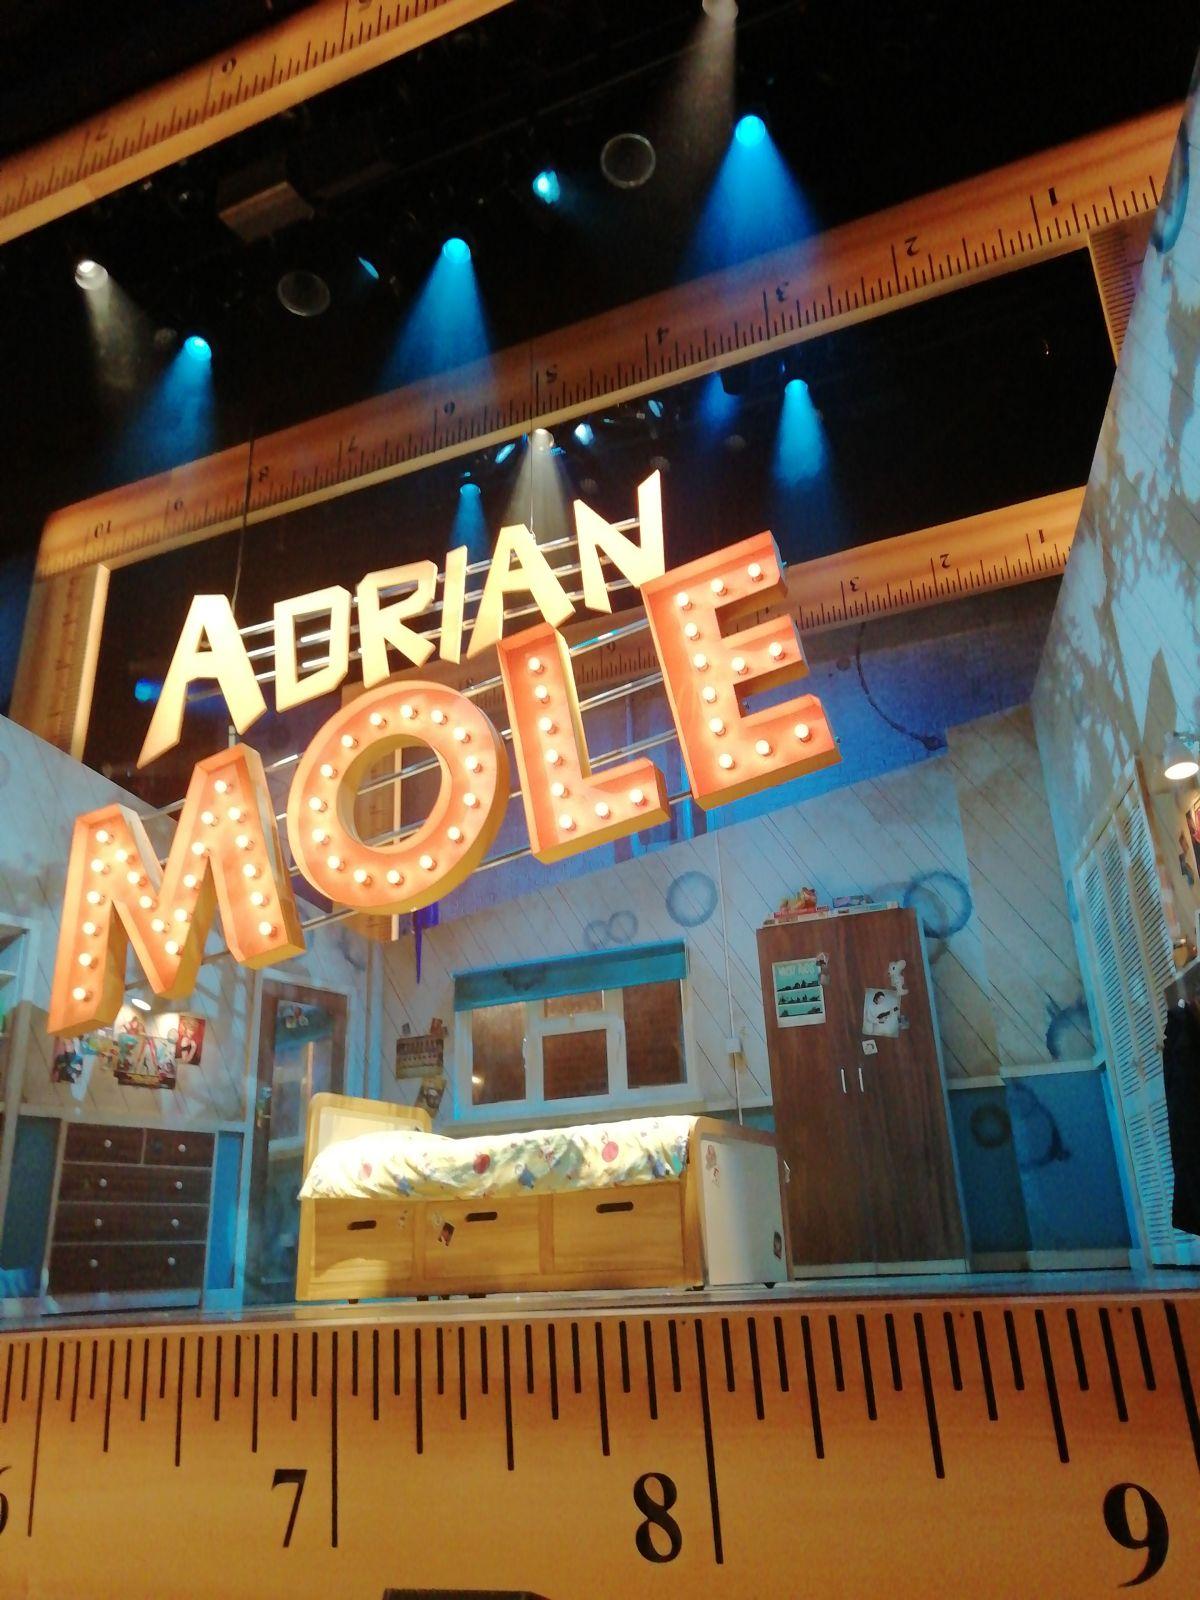 Wholely Moley!